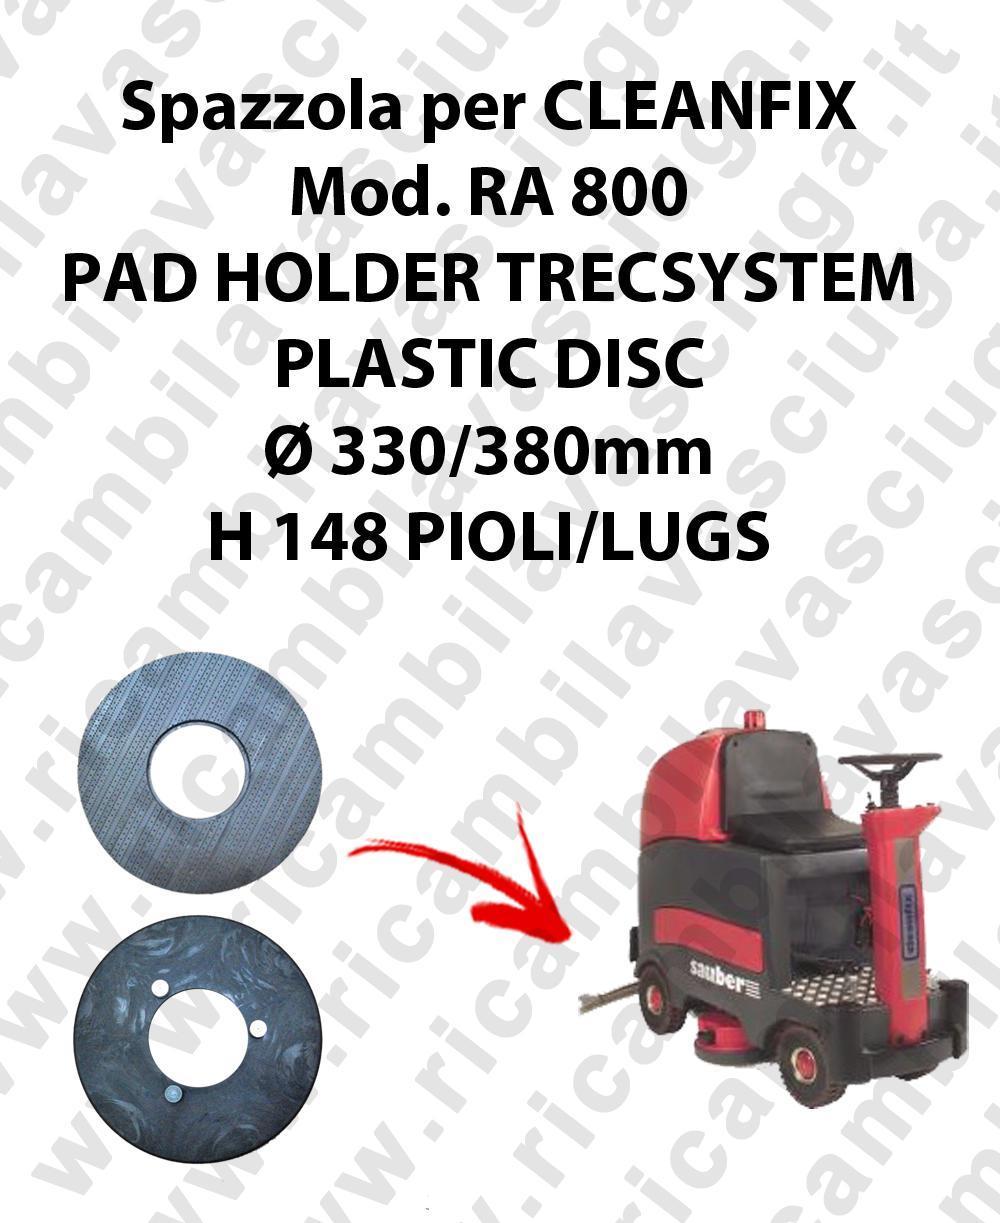 PAD HOLDER TRECSYSTEM  pour autolaveuses CLEANFIX Reference RA 800